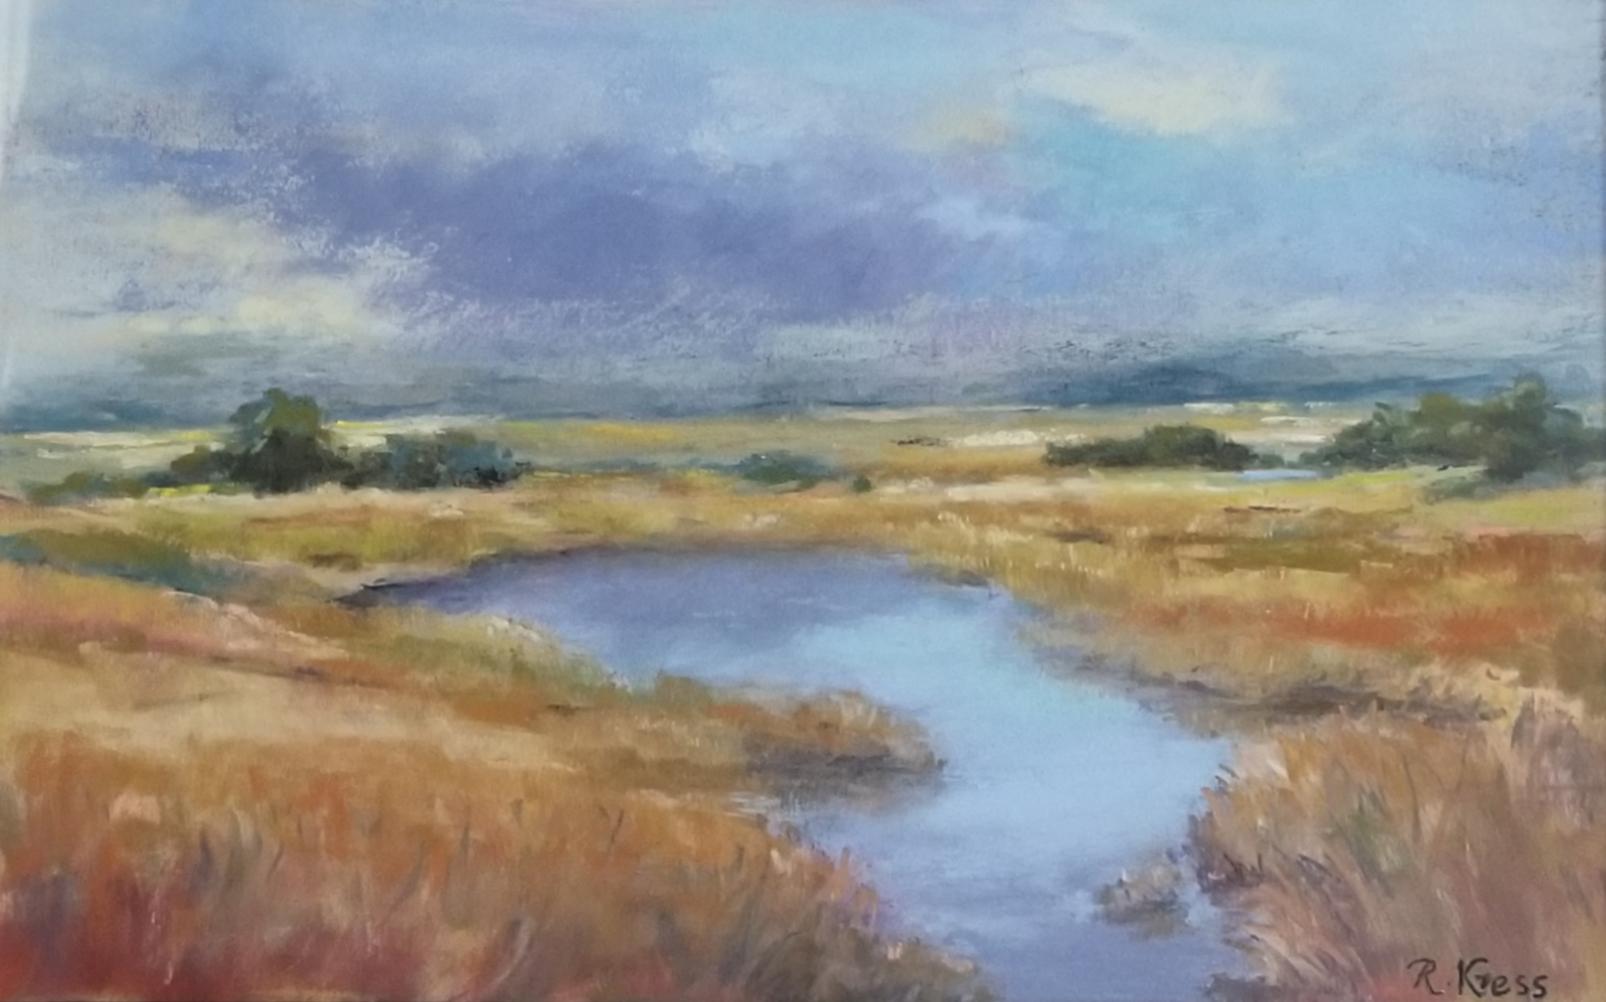 Approaching Storm, Roswitha Kress, 16 x 20, Pastel, $350